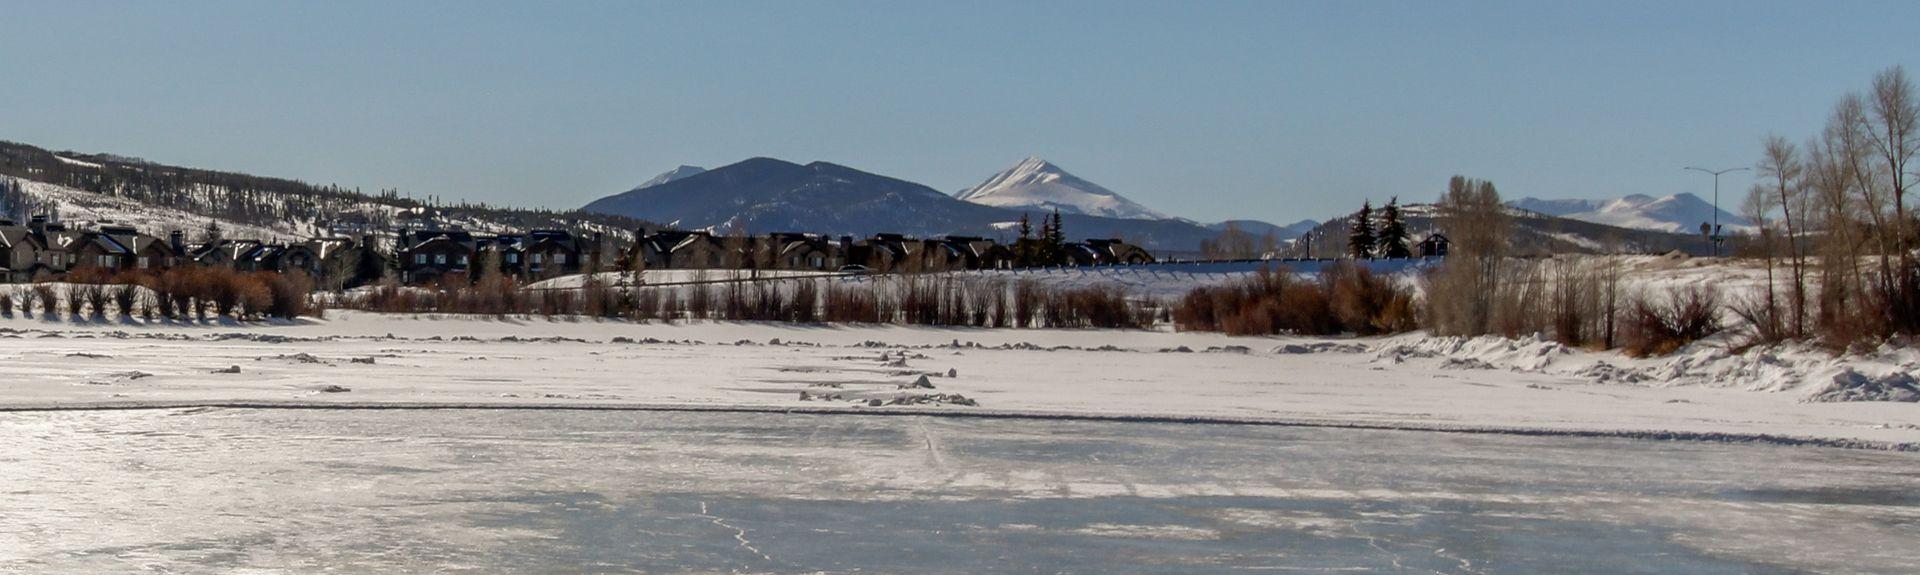 Eagles Nest, Silverthorne, Colorado, Stati Uniti d'America